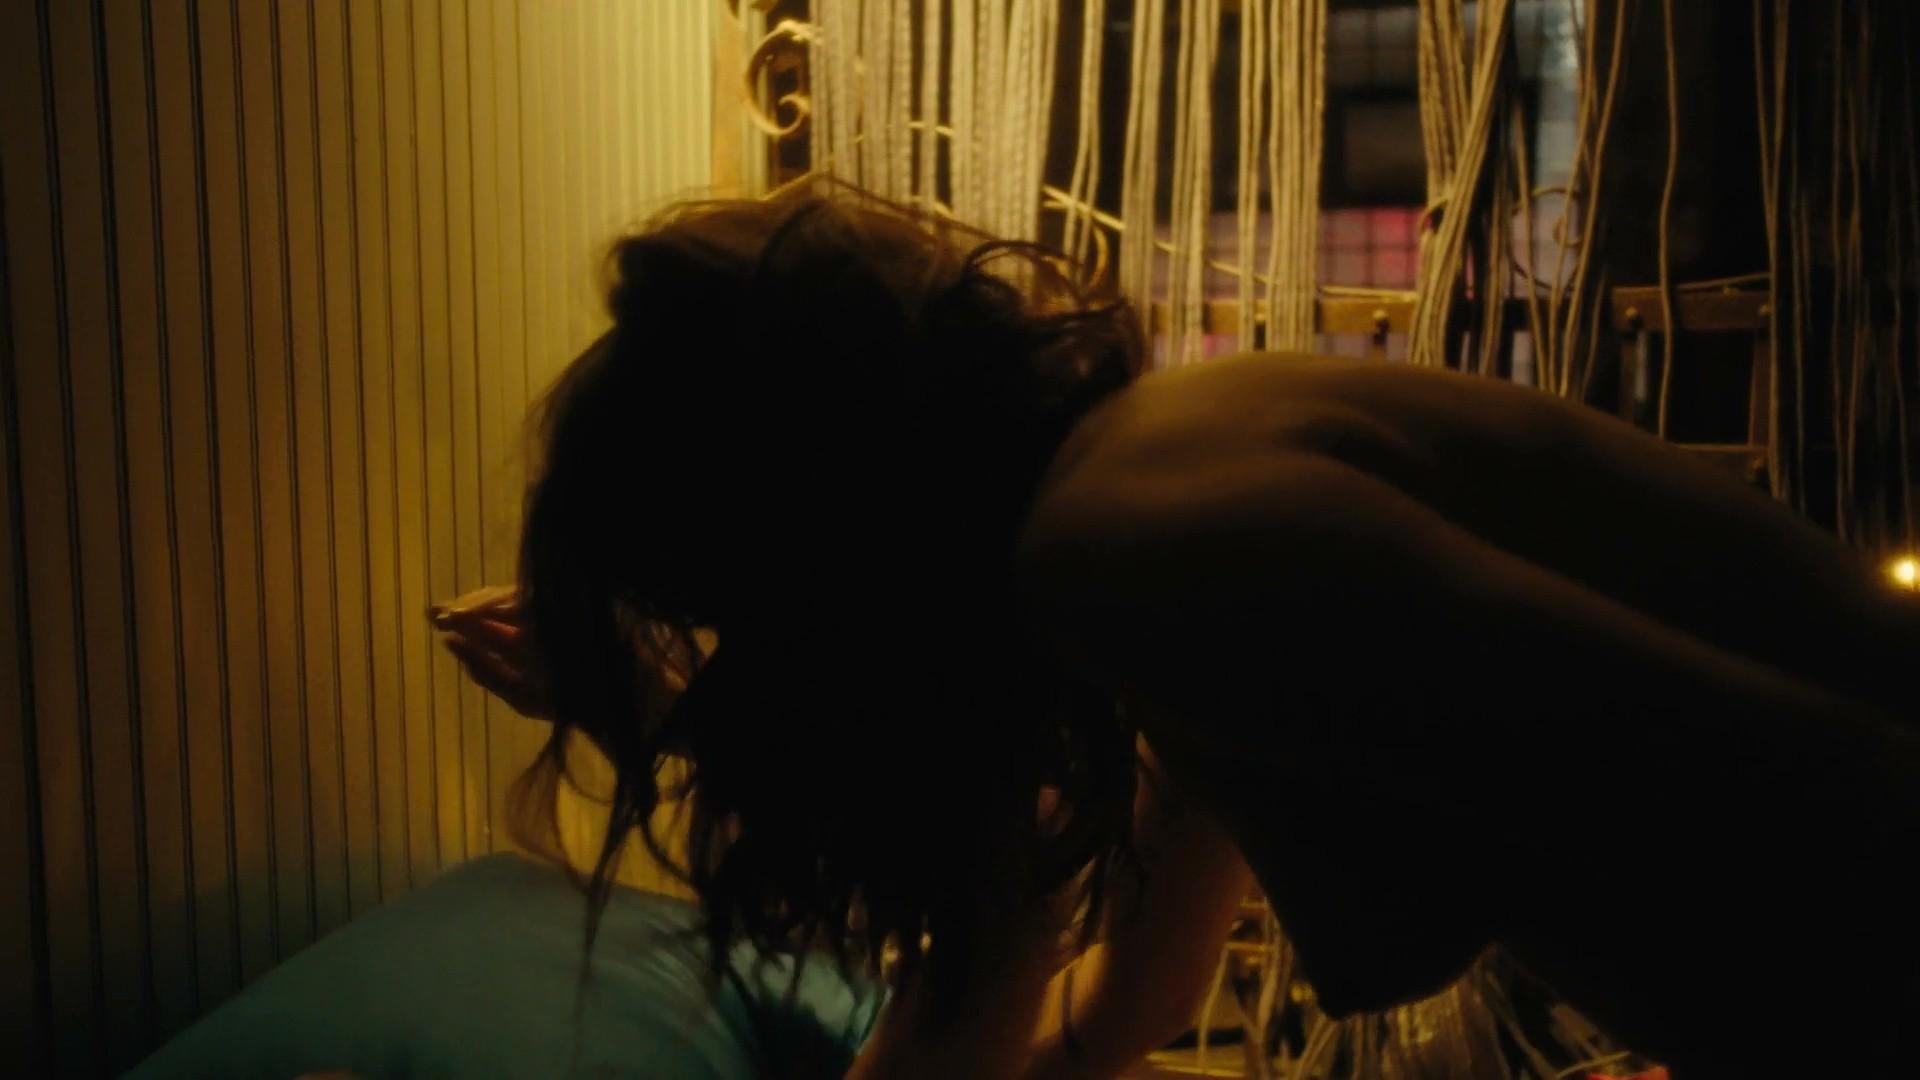 Desnuda Fotos De Sophie Cookson Desnuda Tetas Pezon Culo Coño